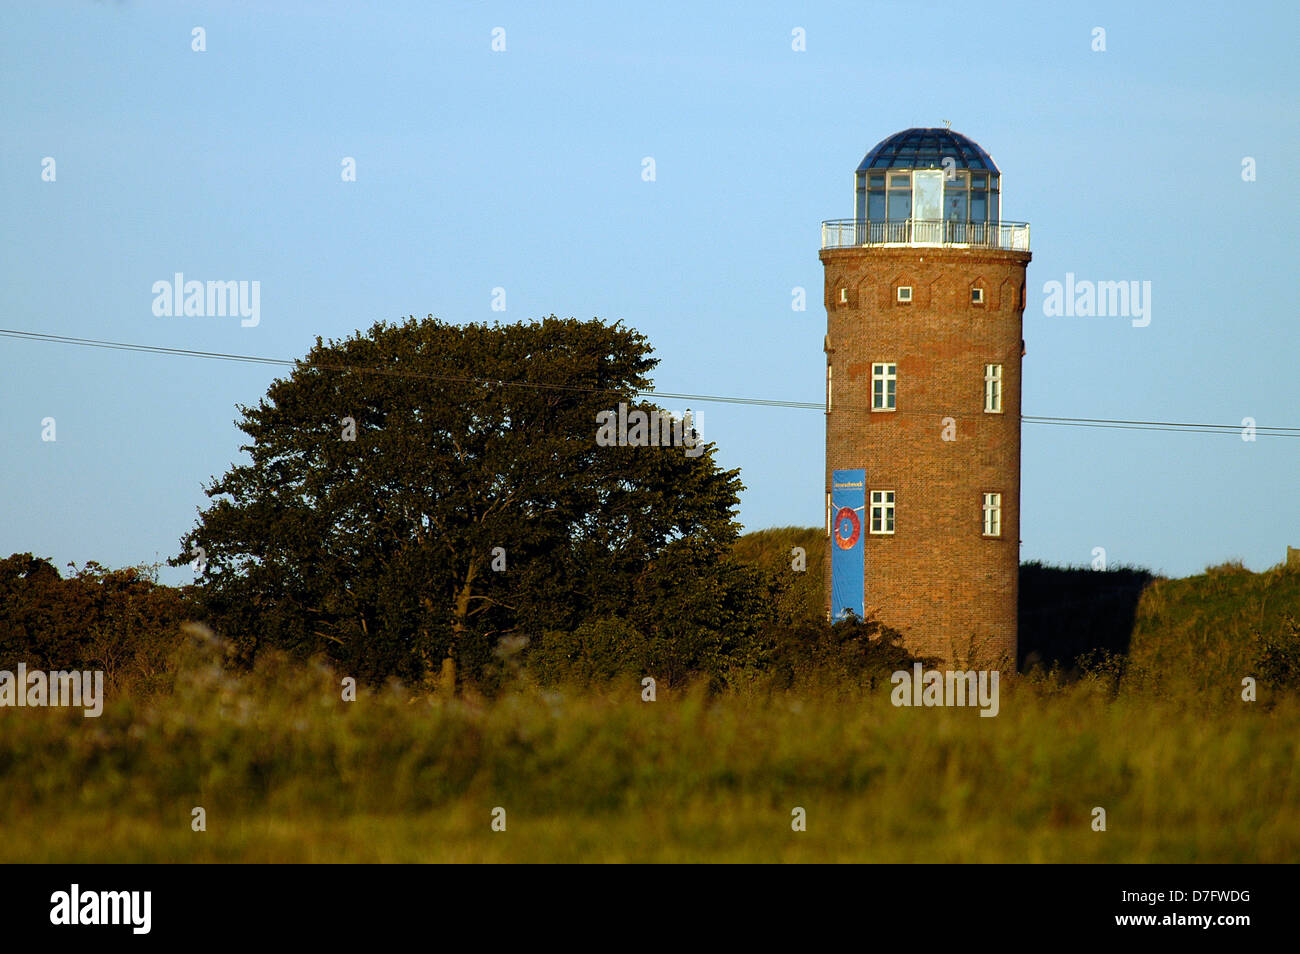 The Baltic Sea, Rügen, cape Arkona, observation tower, Kap Arkona, Germany - Stock Image